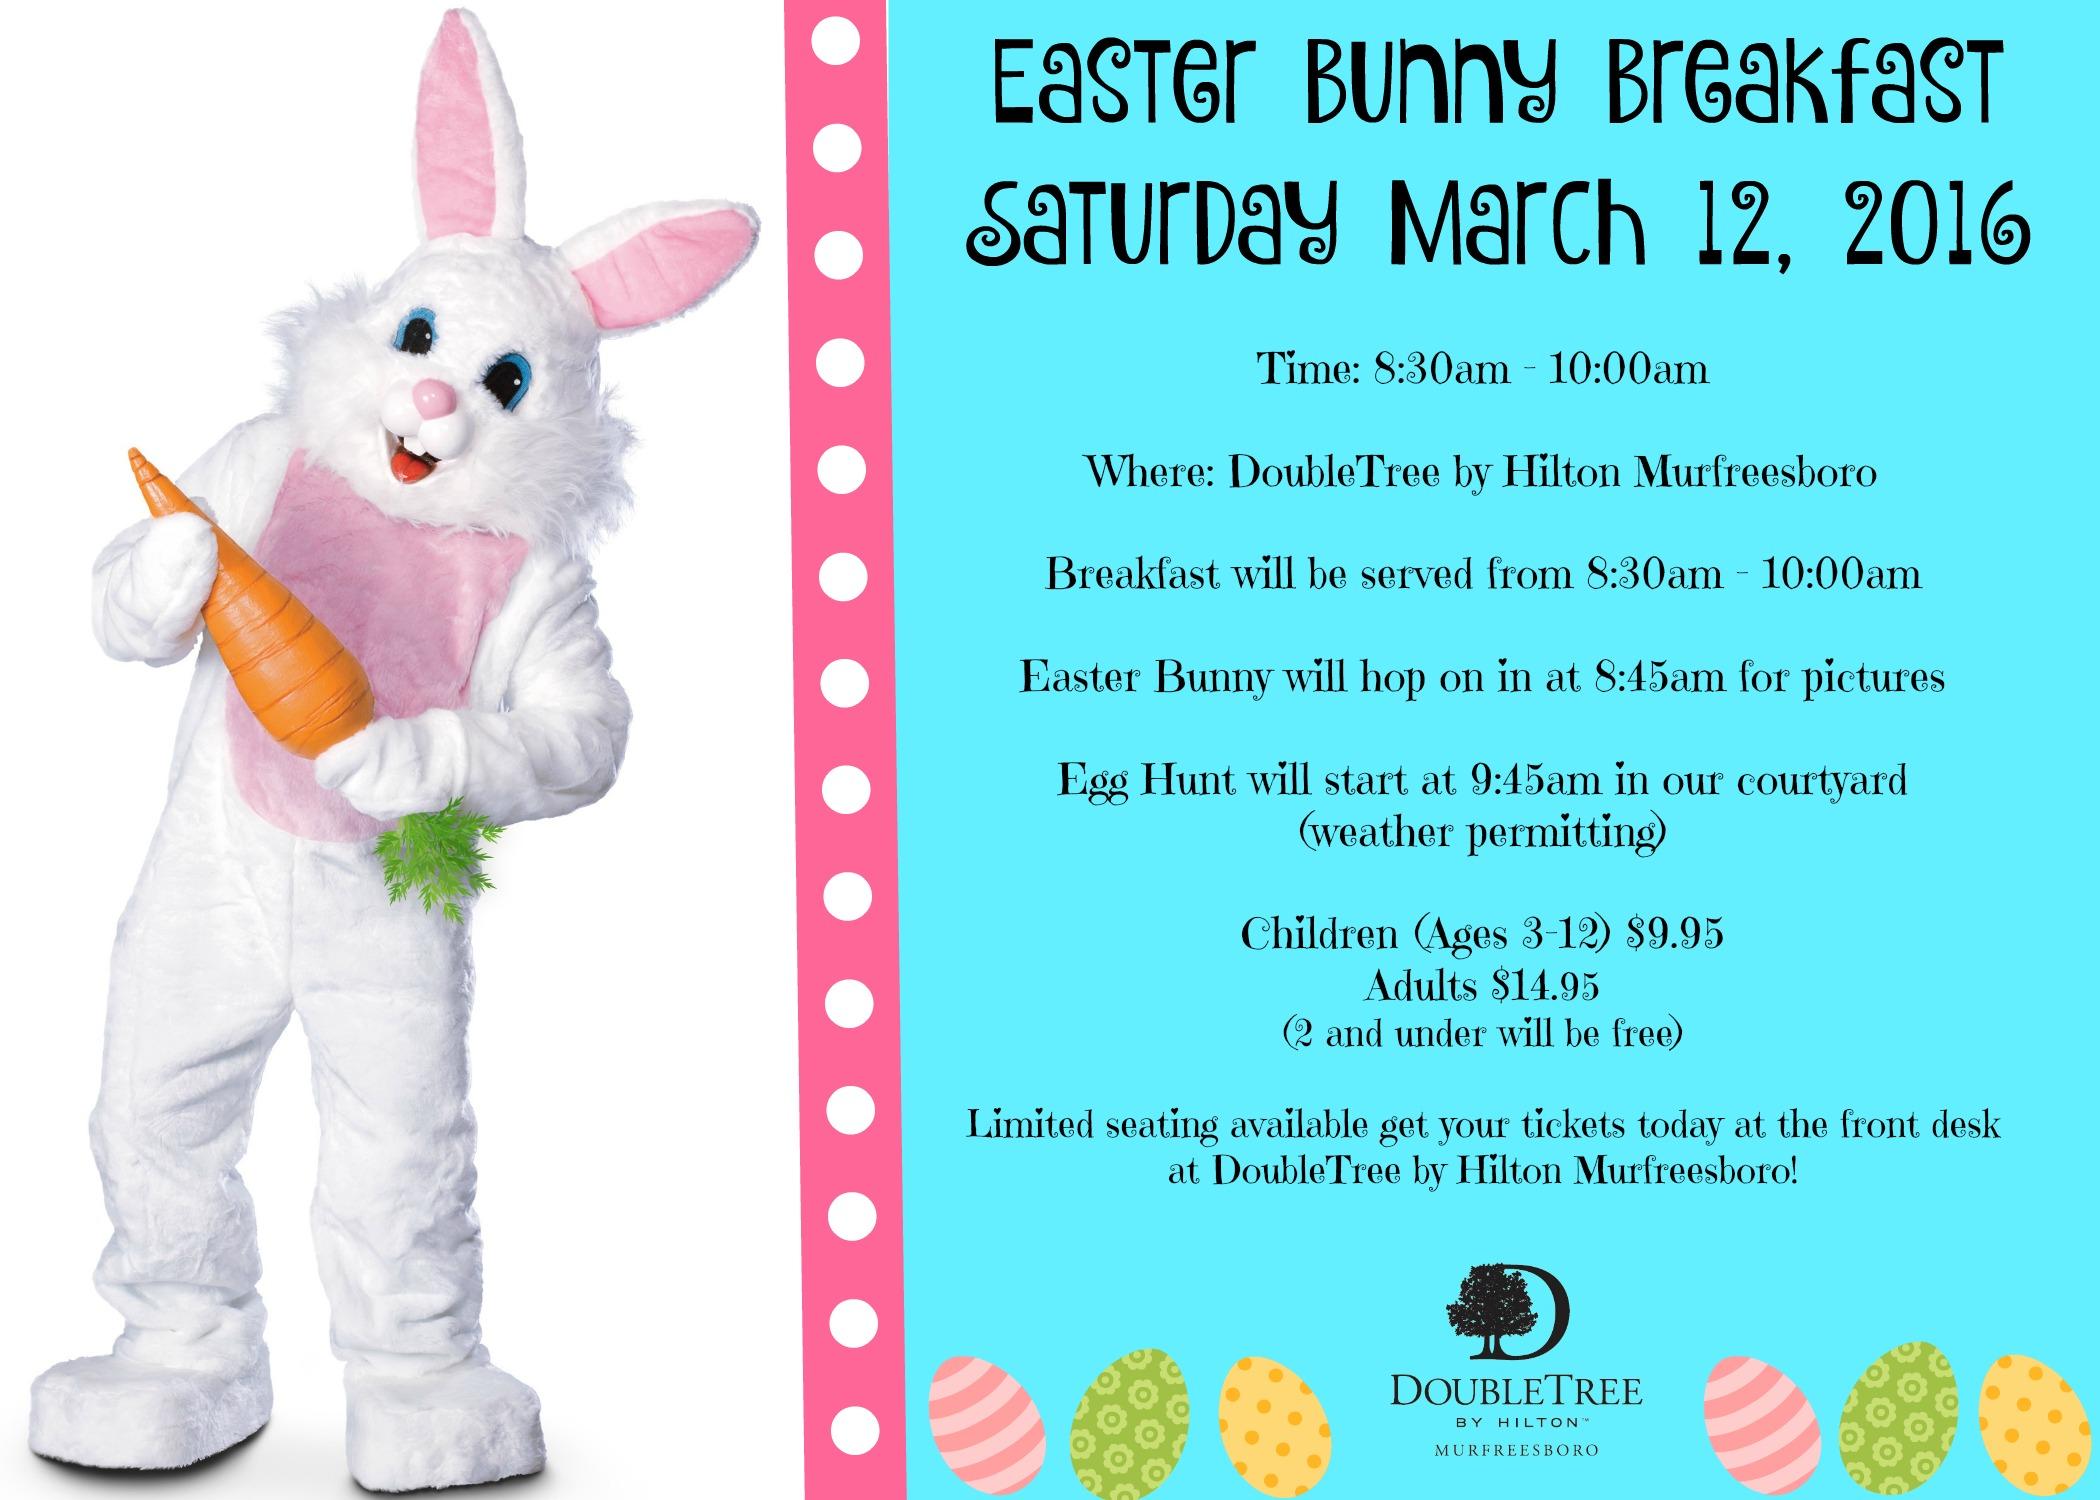 Easter Bunny Breakfast in Murfreesboro